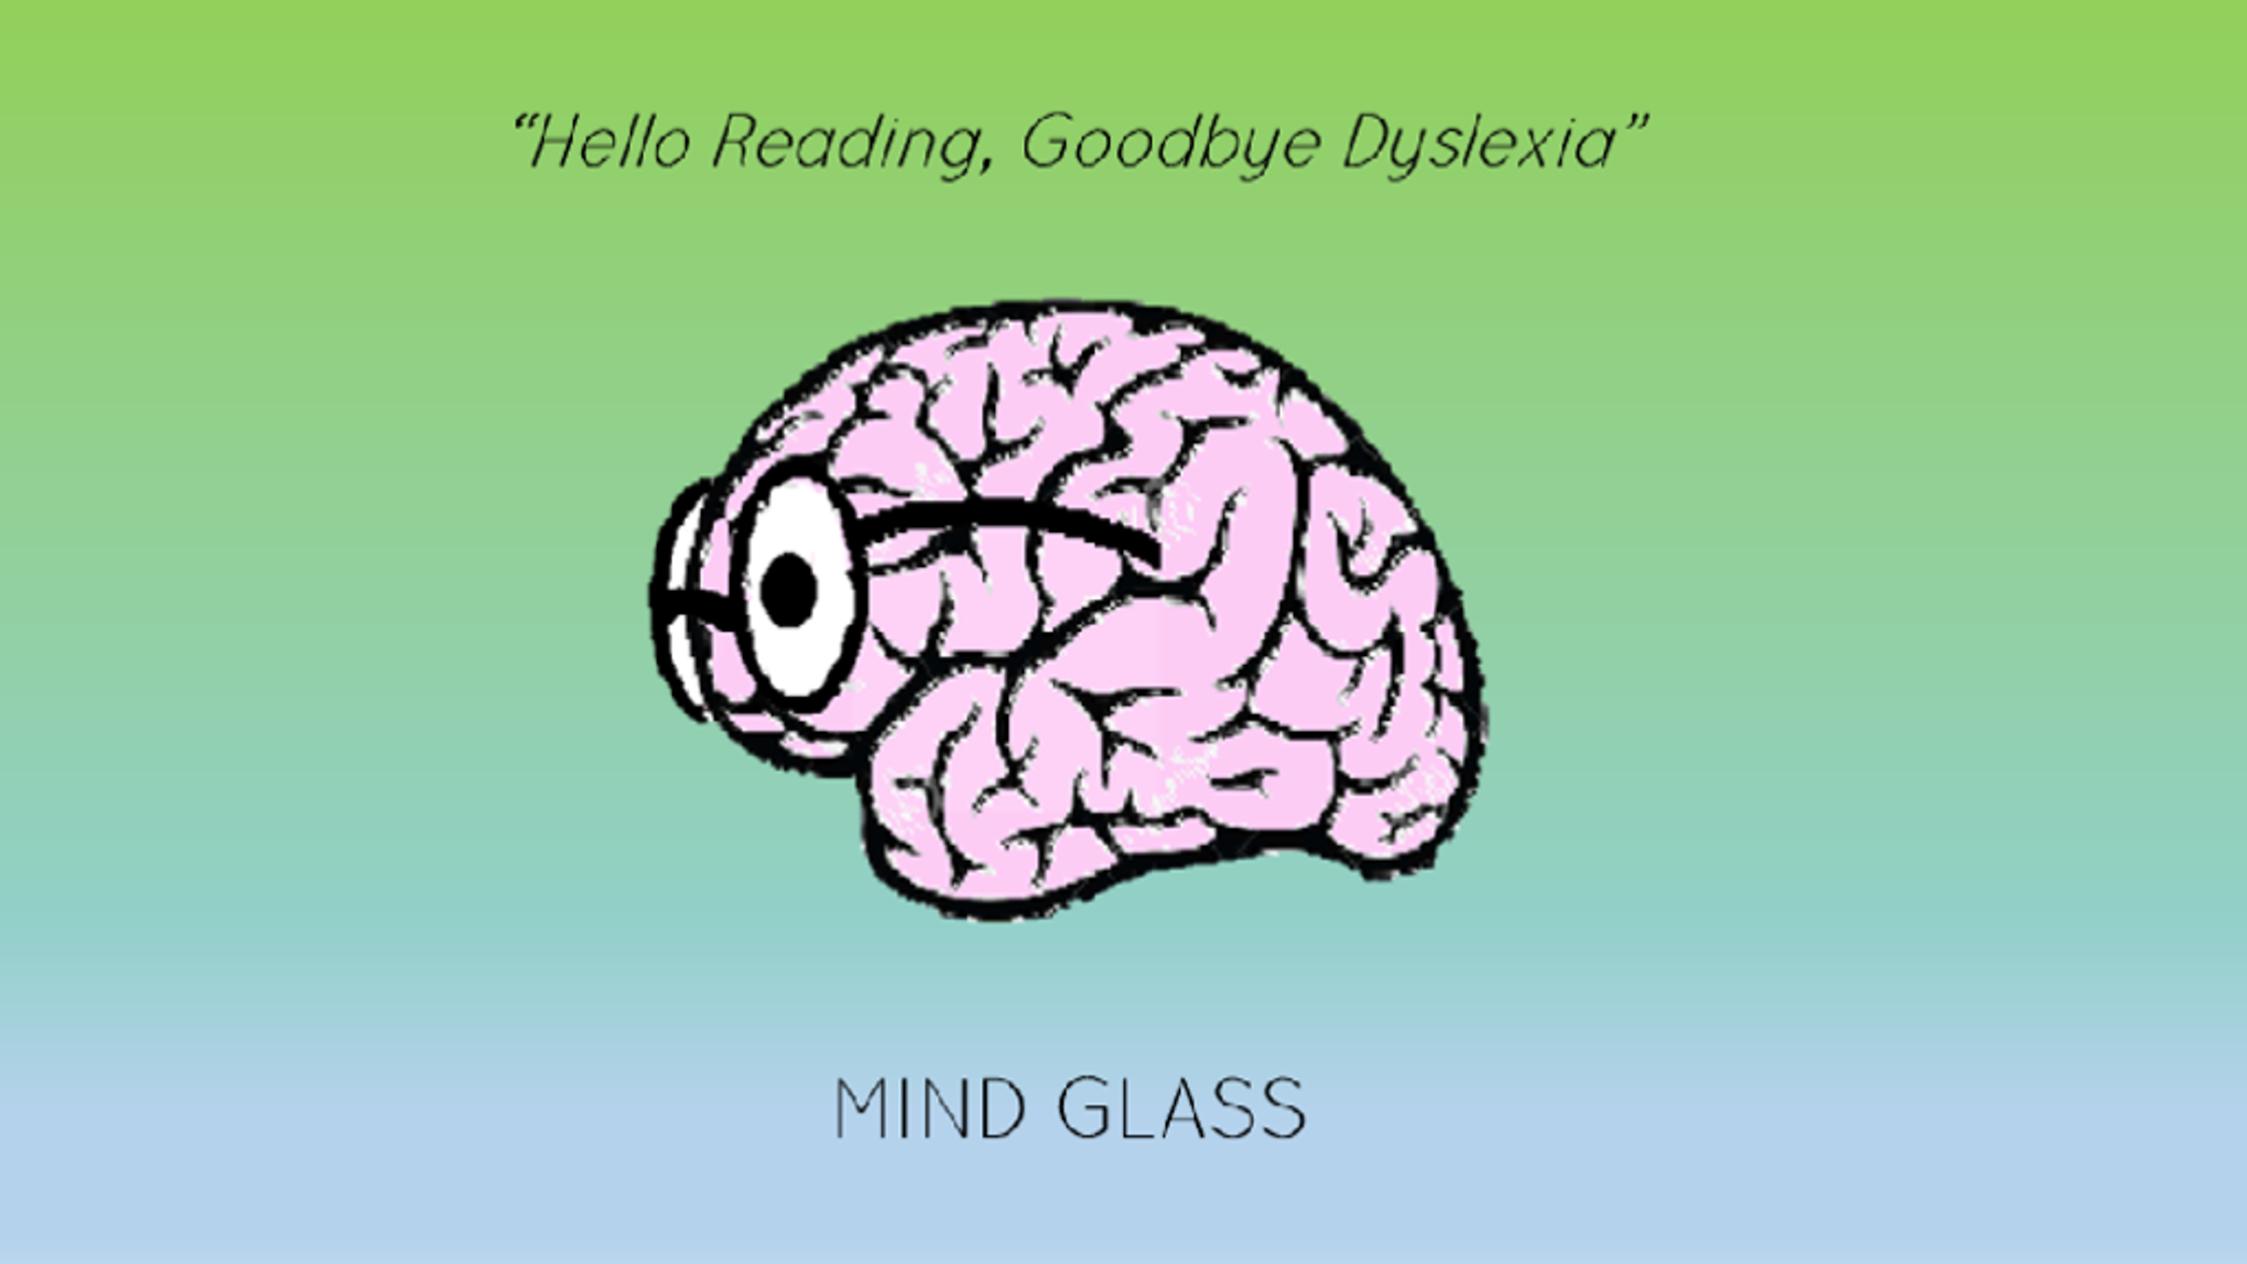 Mind Glass